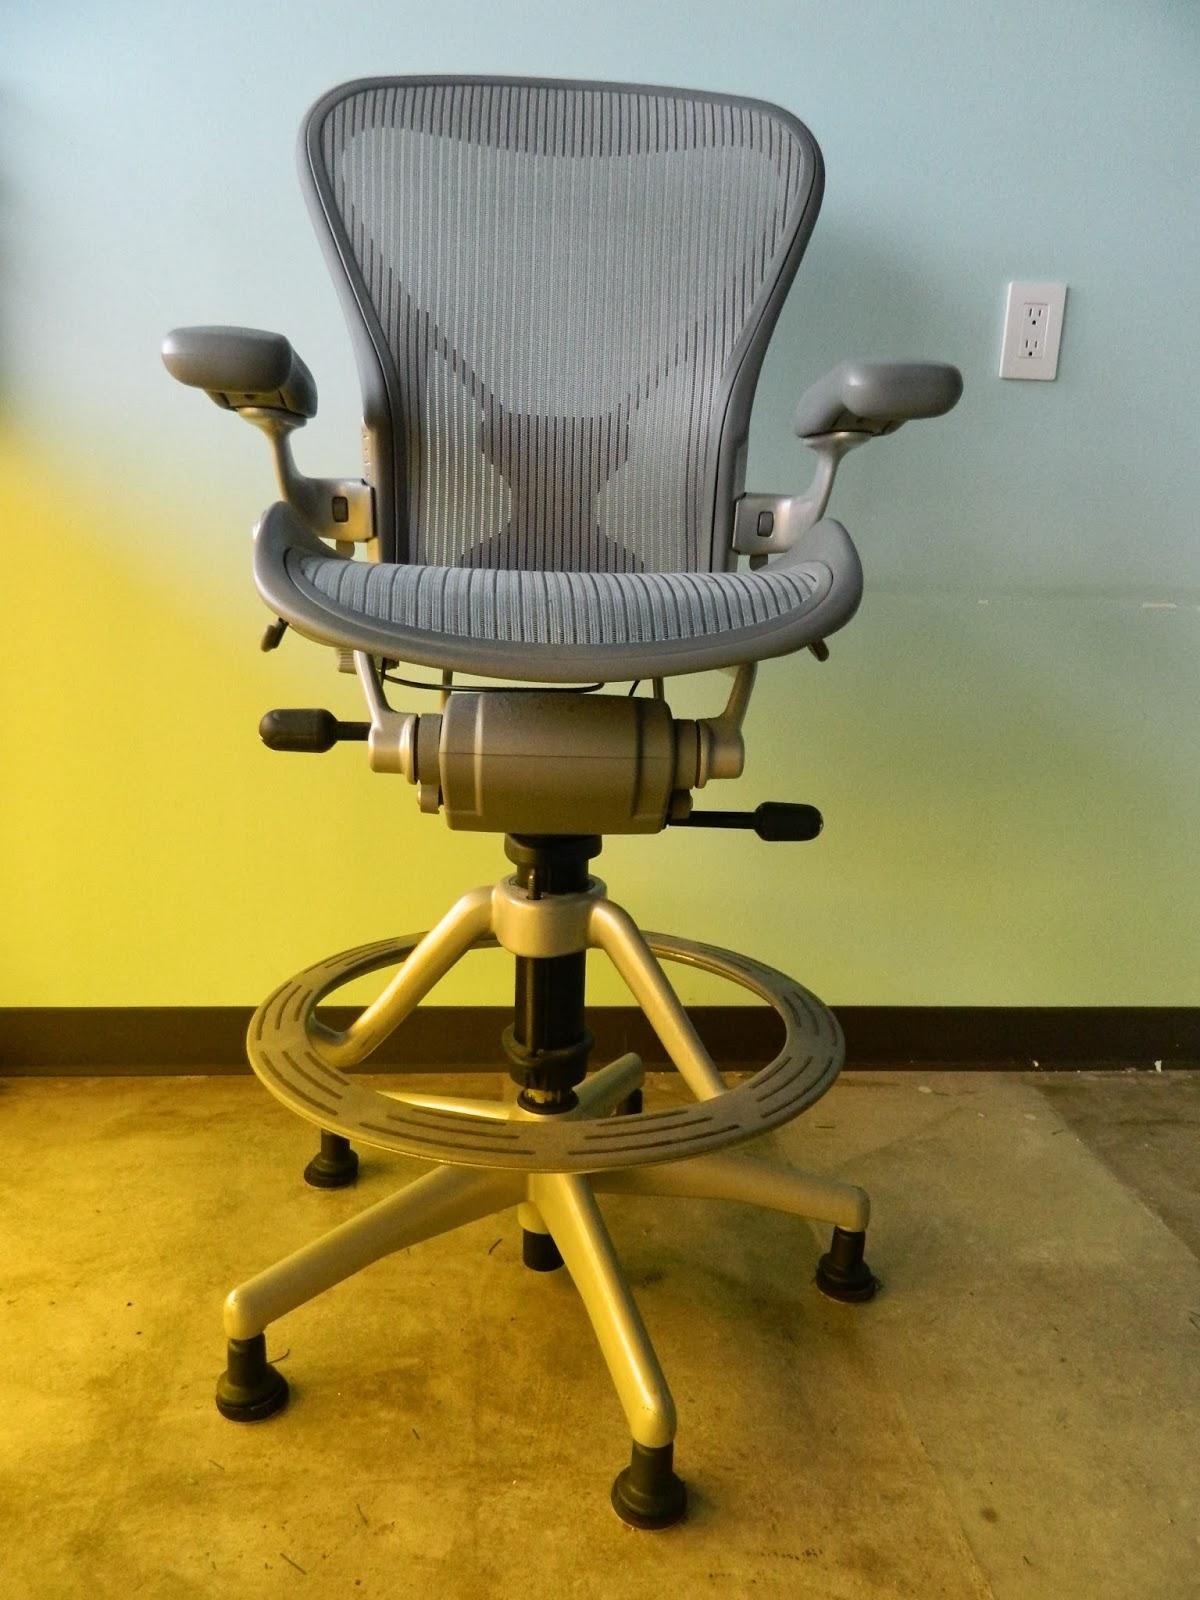 Ergonomic Chair Law Unusual Swivel Roland Dressler Collection Galveston Texas Office